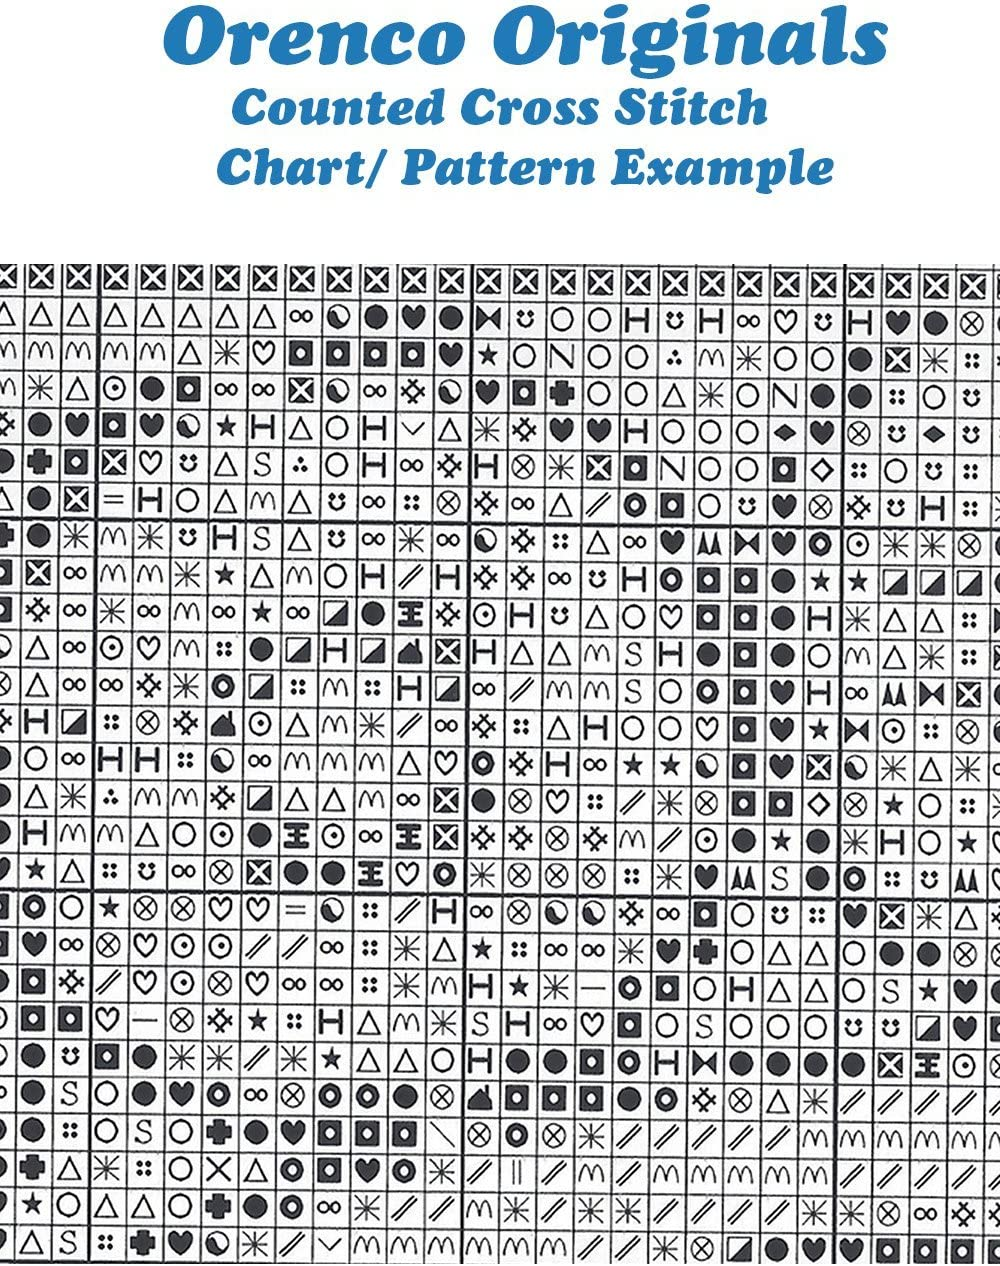 Orenco Originals Amish Quilt Design Treasury #2 Counted Cross Stitch Charts Bonus Pattern